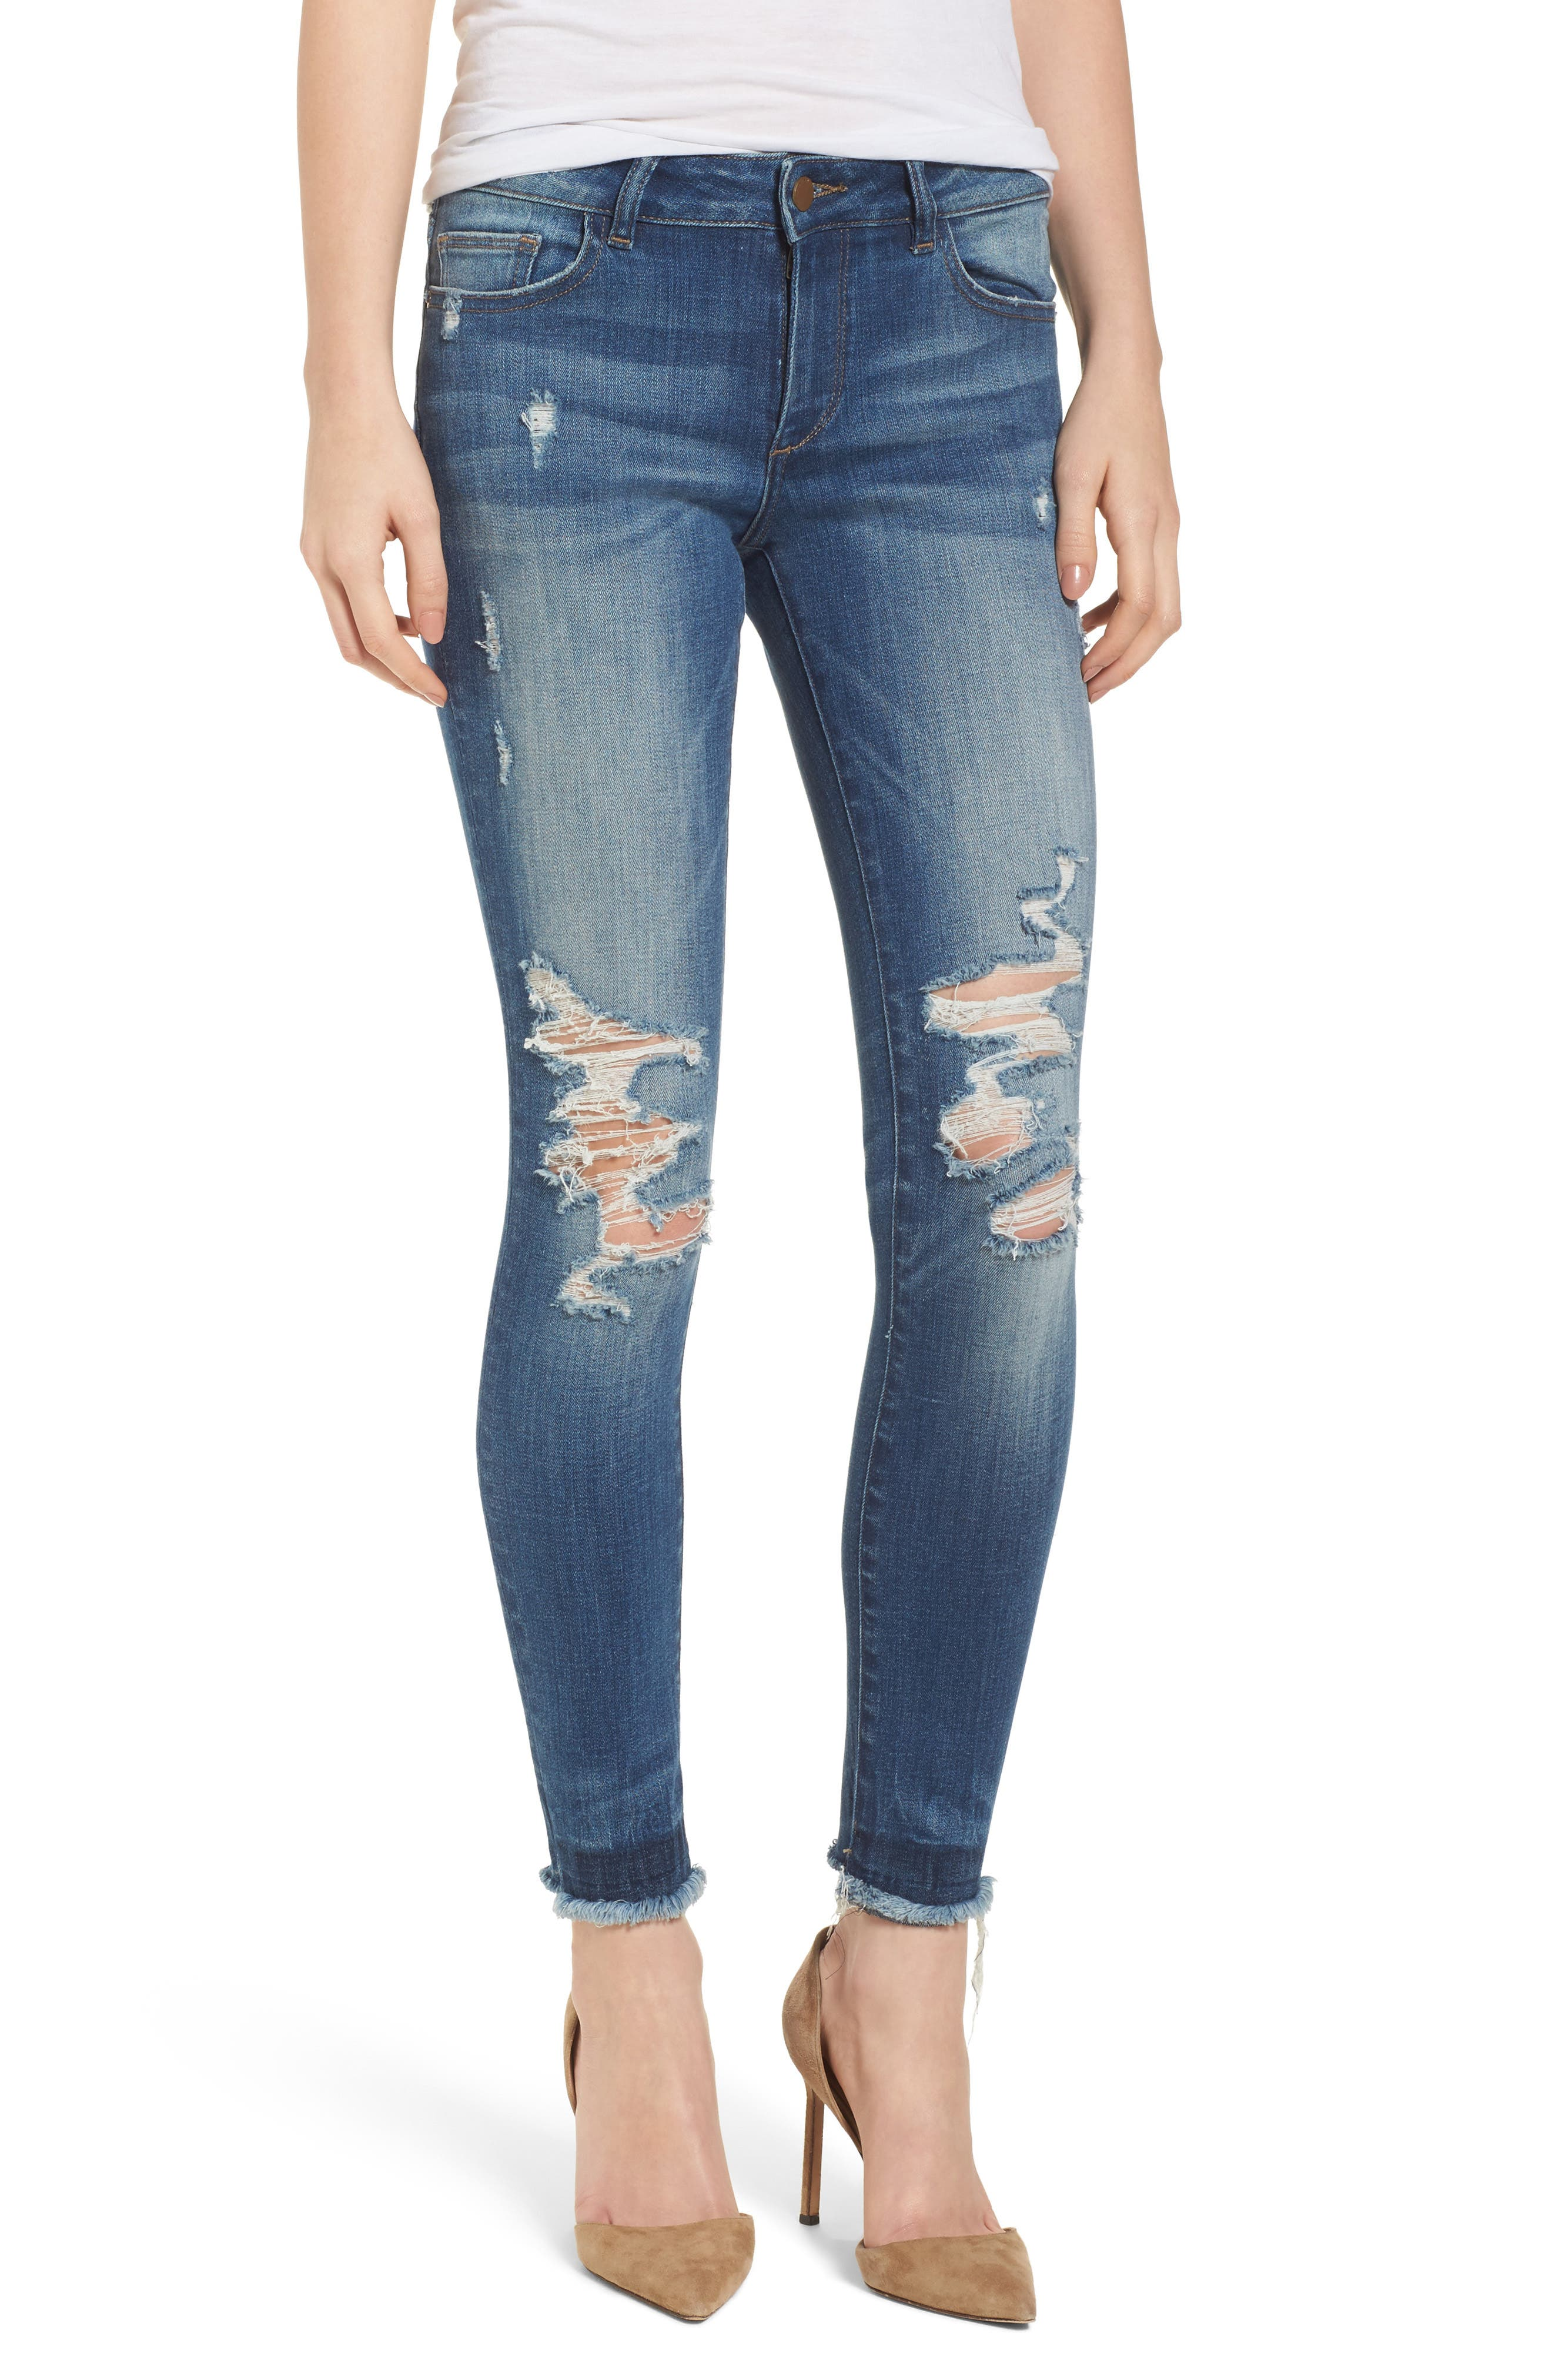 Emma Power Legging Jeans,                         Main,                         color, Westwood